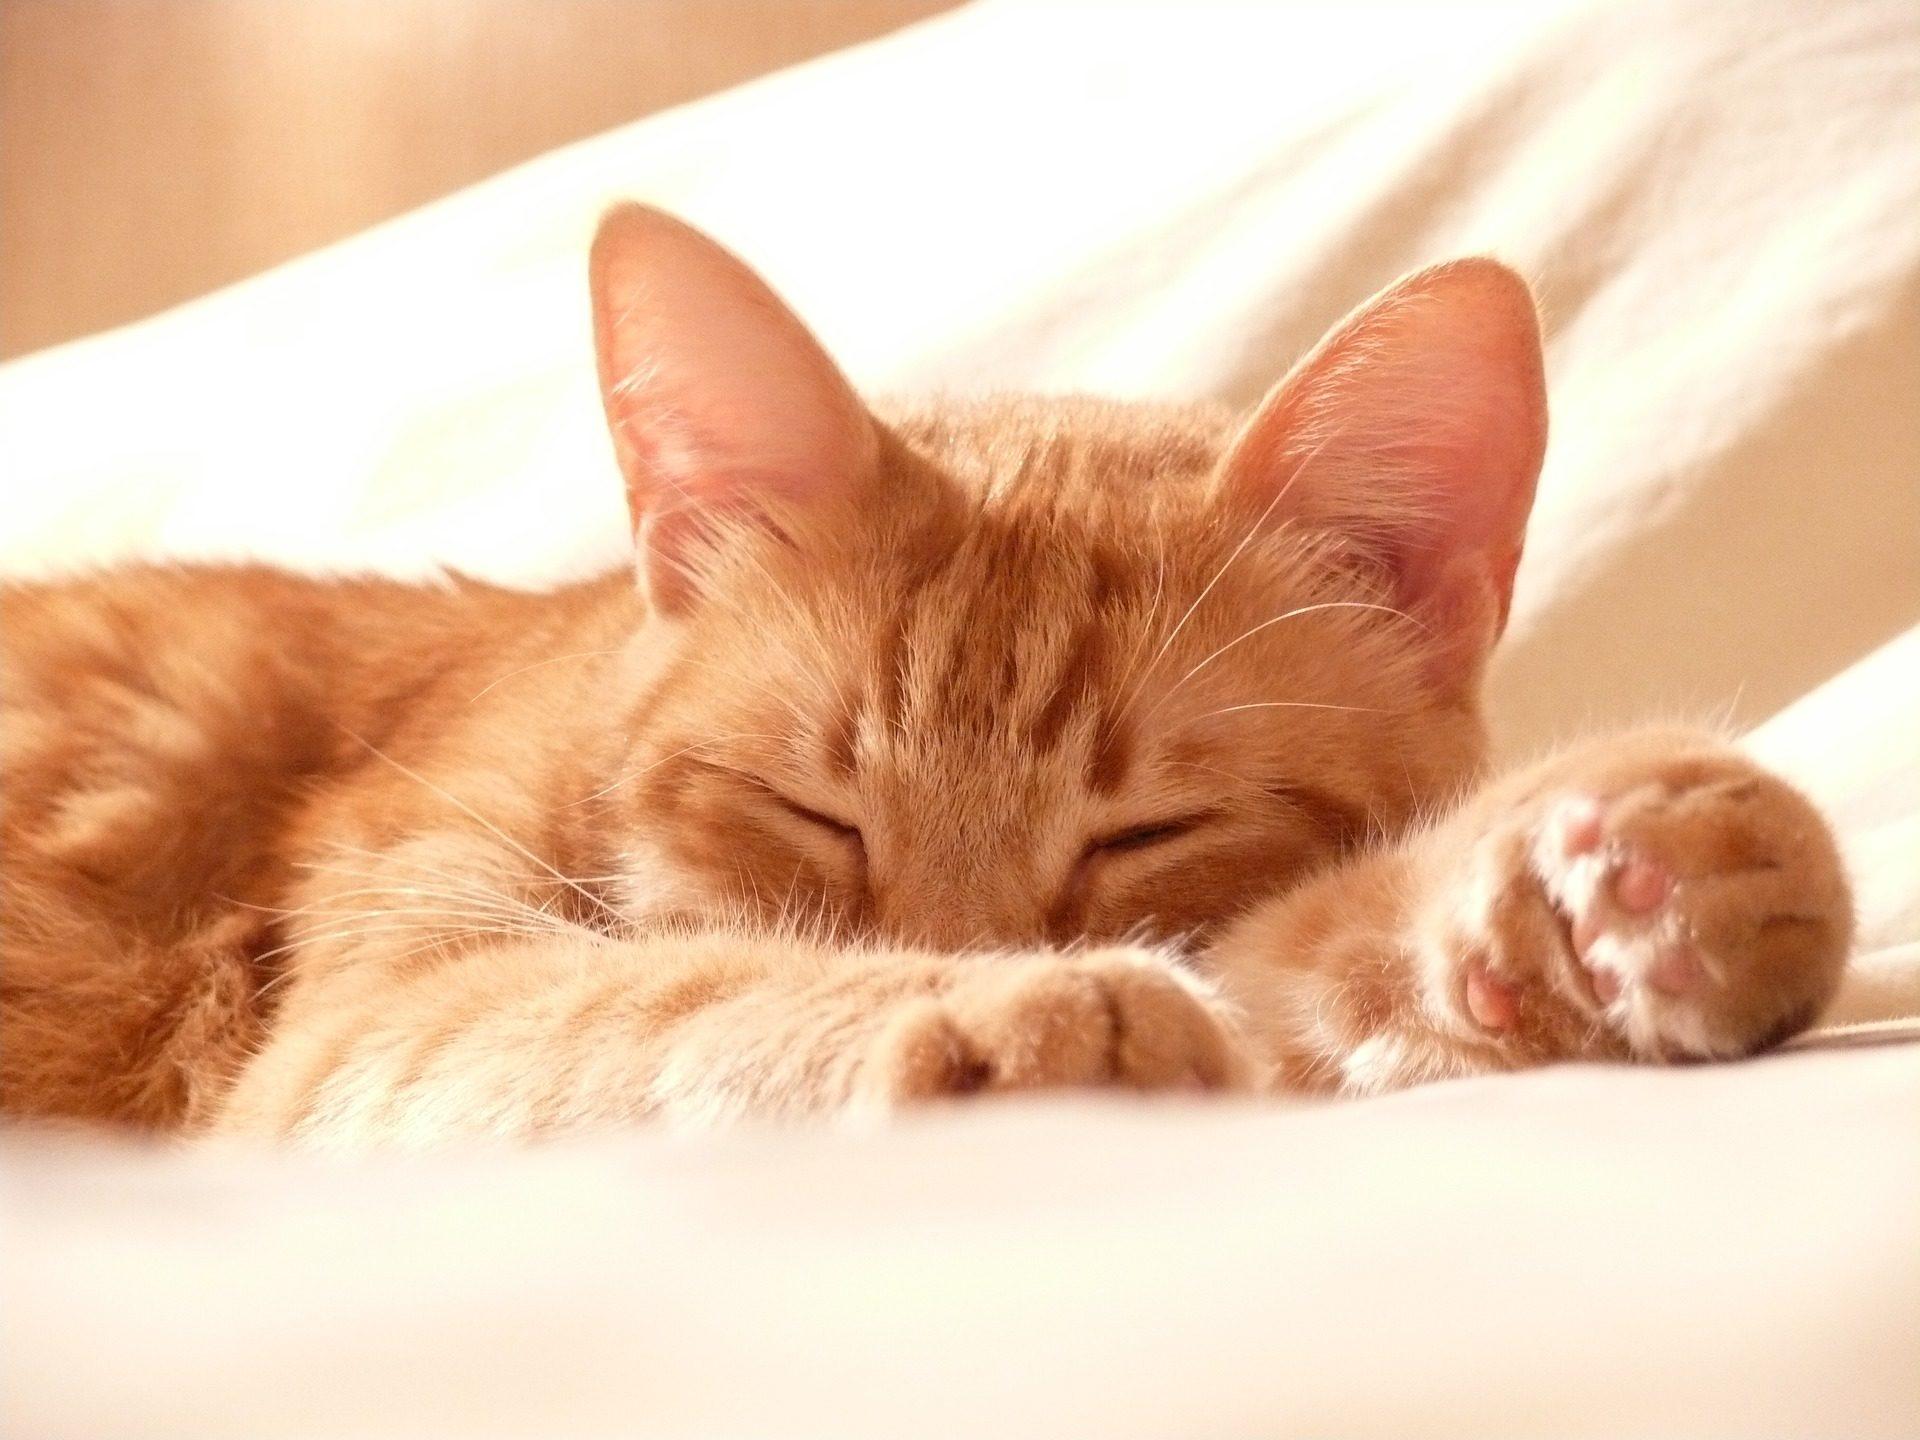 gato, mascota, dormido, relax, compañía - Fondos de Pantalla HD - professor-falken.com